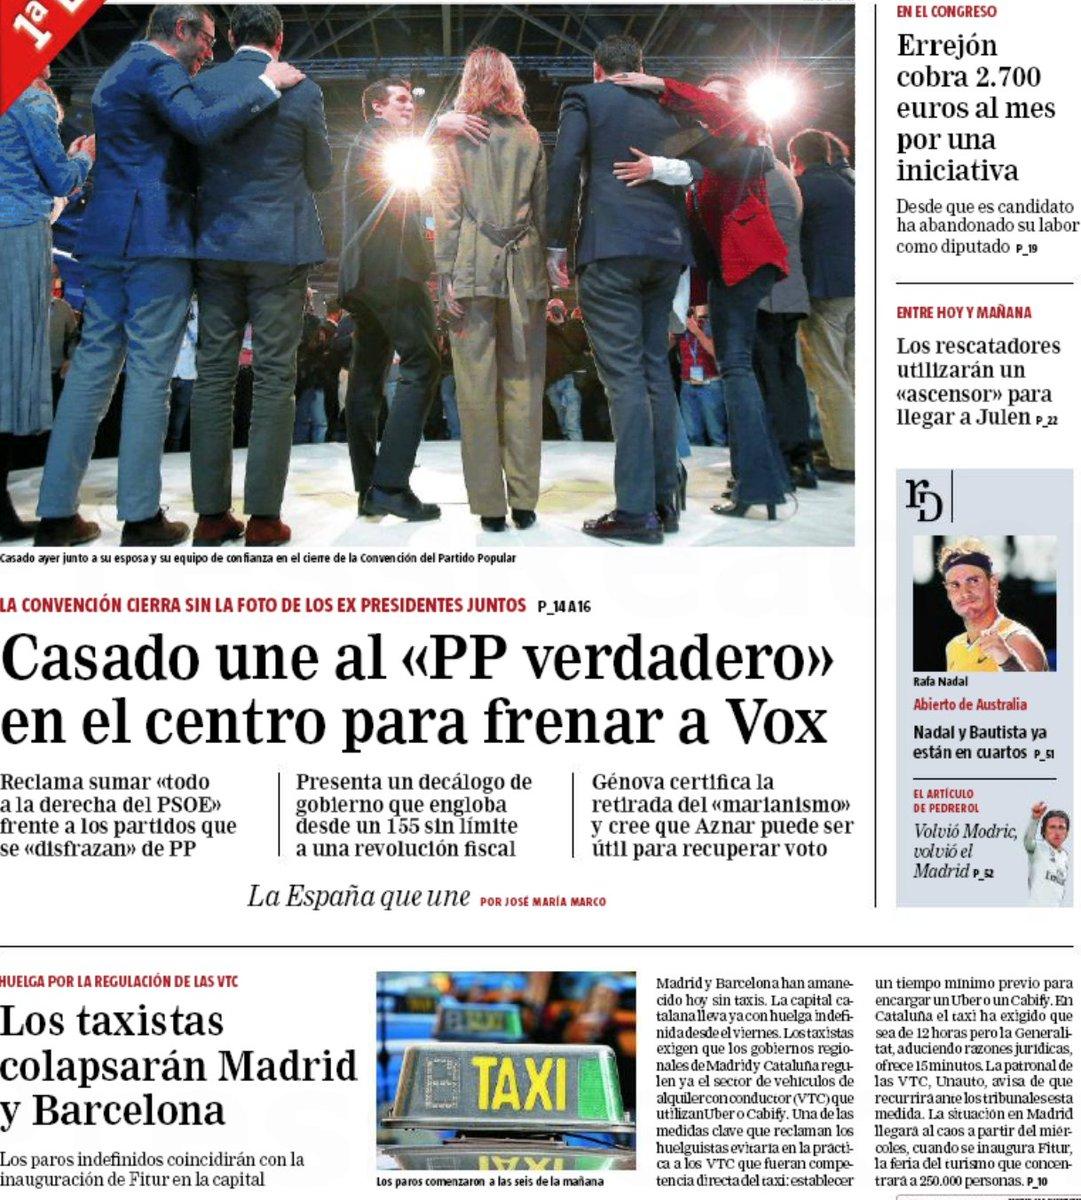 LA VIÑETA  21E :   #OpenArms secuestrado #FelizLunes #Portada #Portadas #EnPortada https://t.co/q7WwkeGMUh